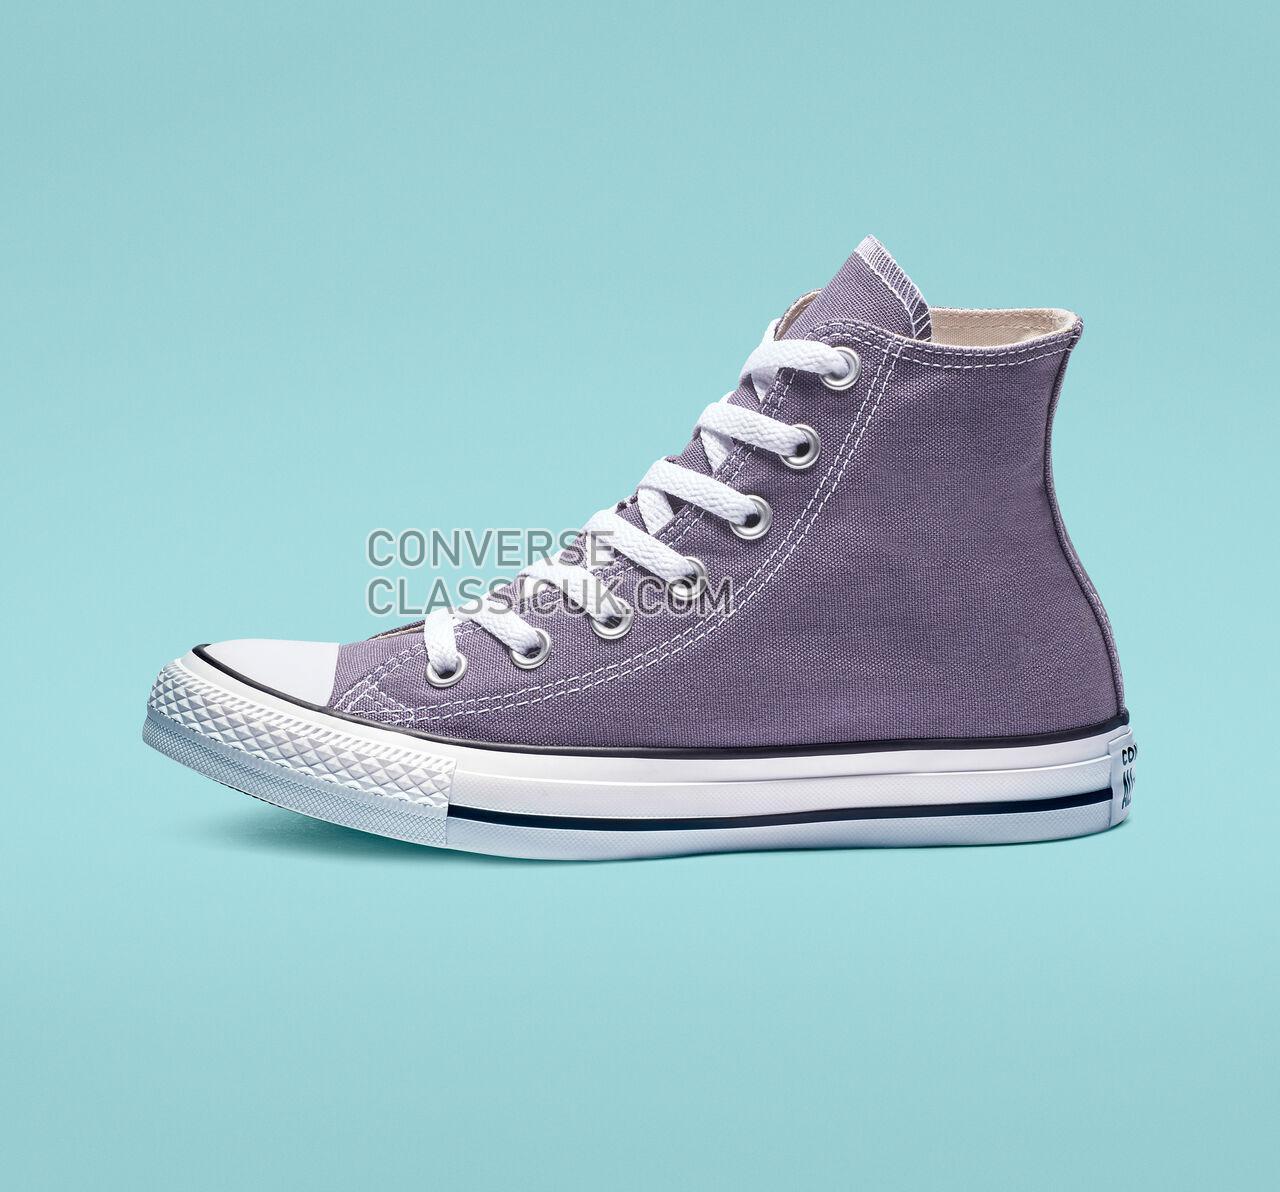 Converse Chuck Taylor All Star Seasonal Colors High Top Mens Womens Unisex 163352F Moody Purple Shoes